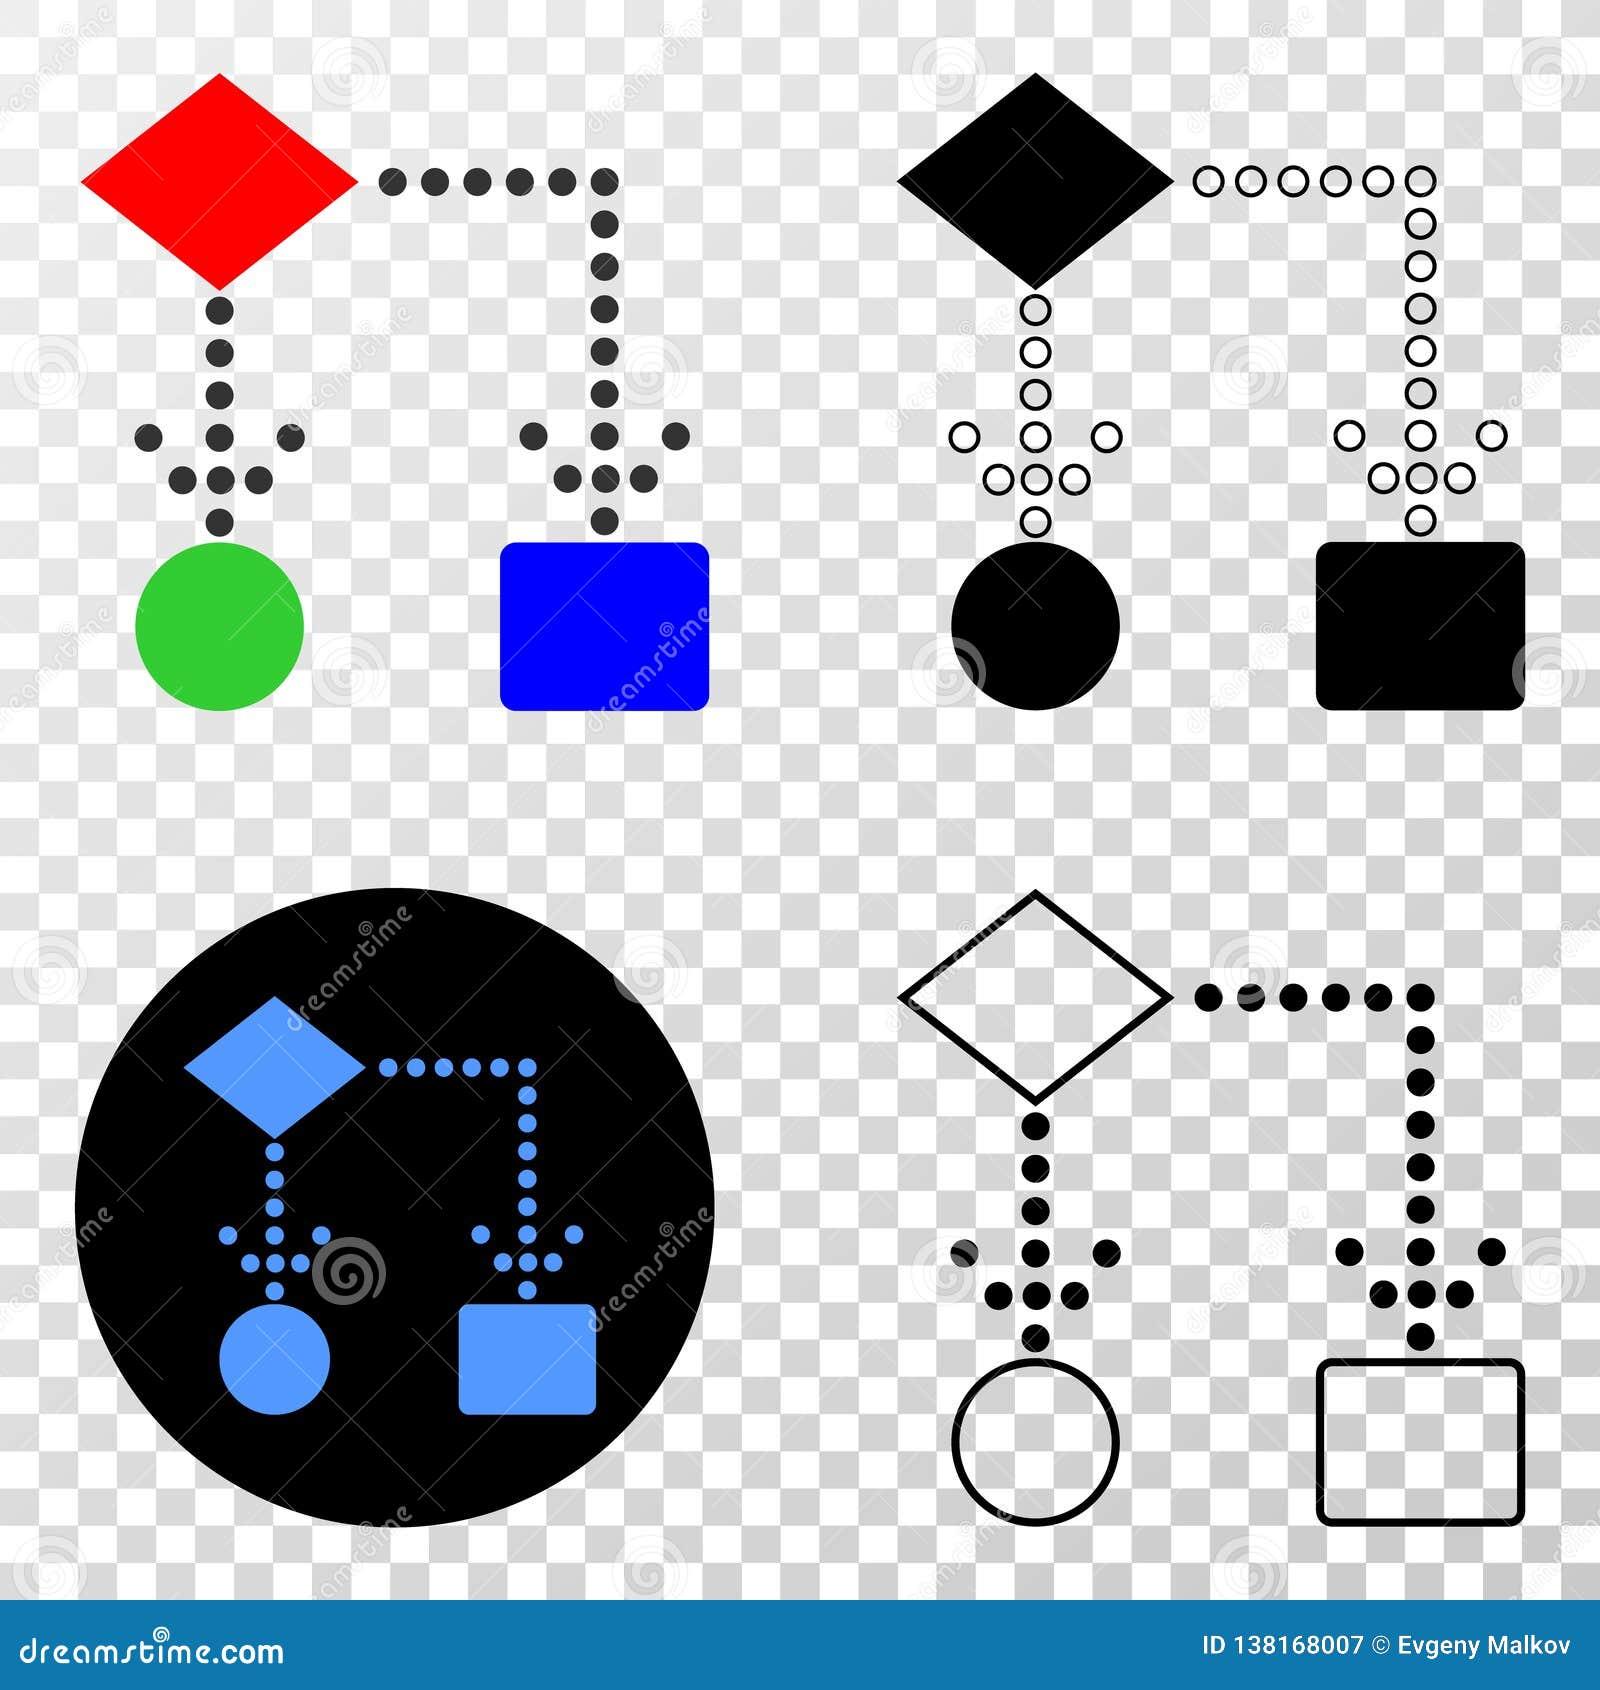 Block Diagram Vector Eps Icon With Contour Version Stock Vector